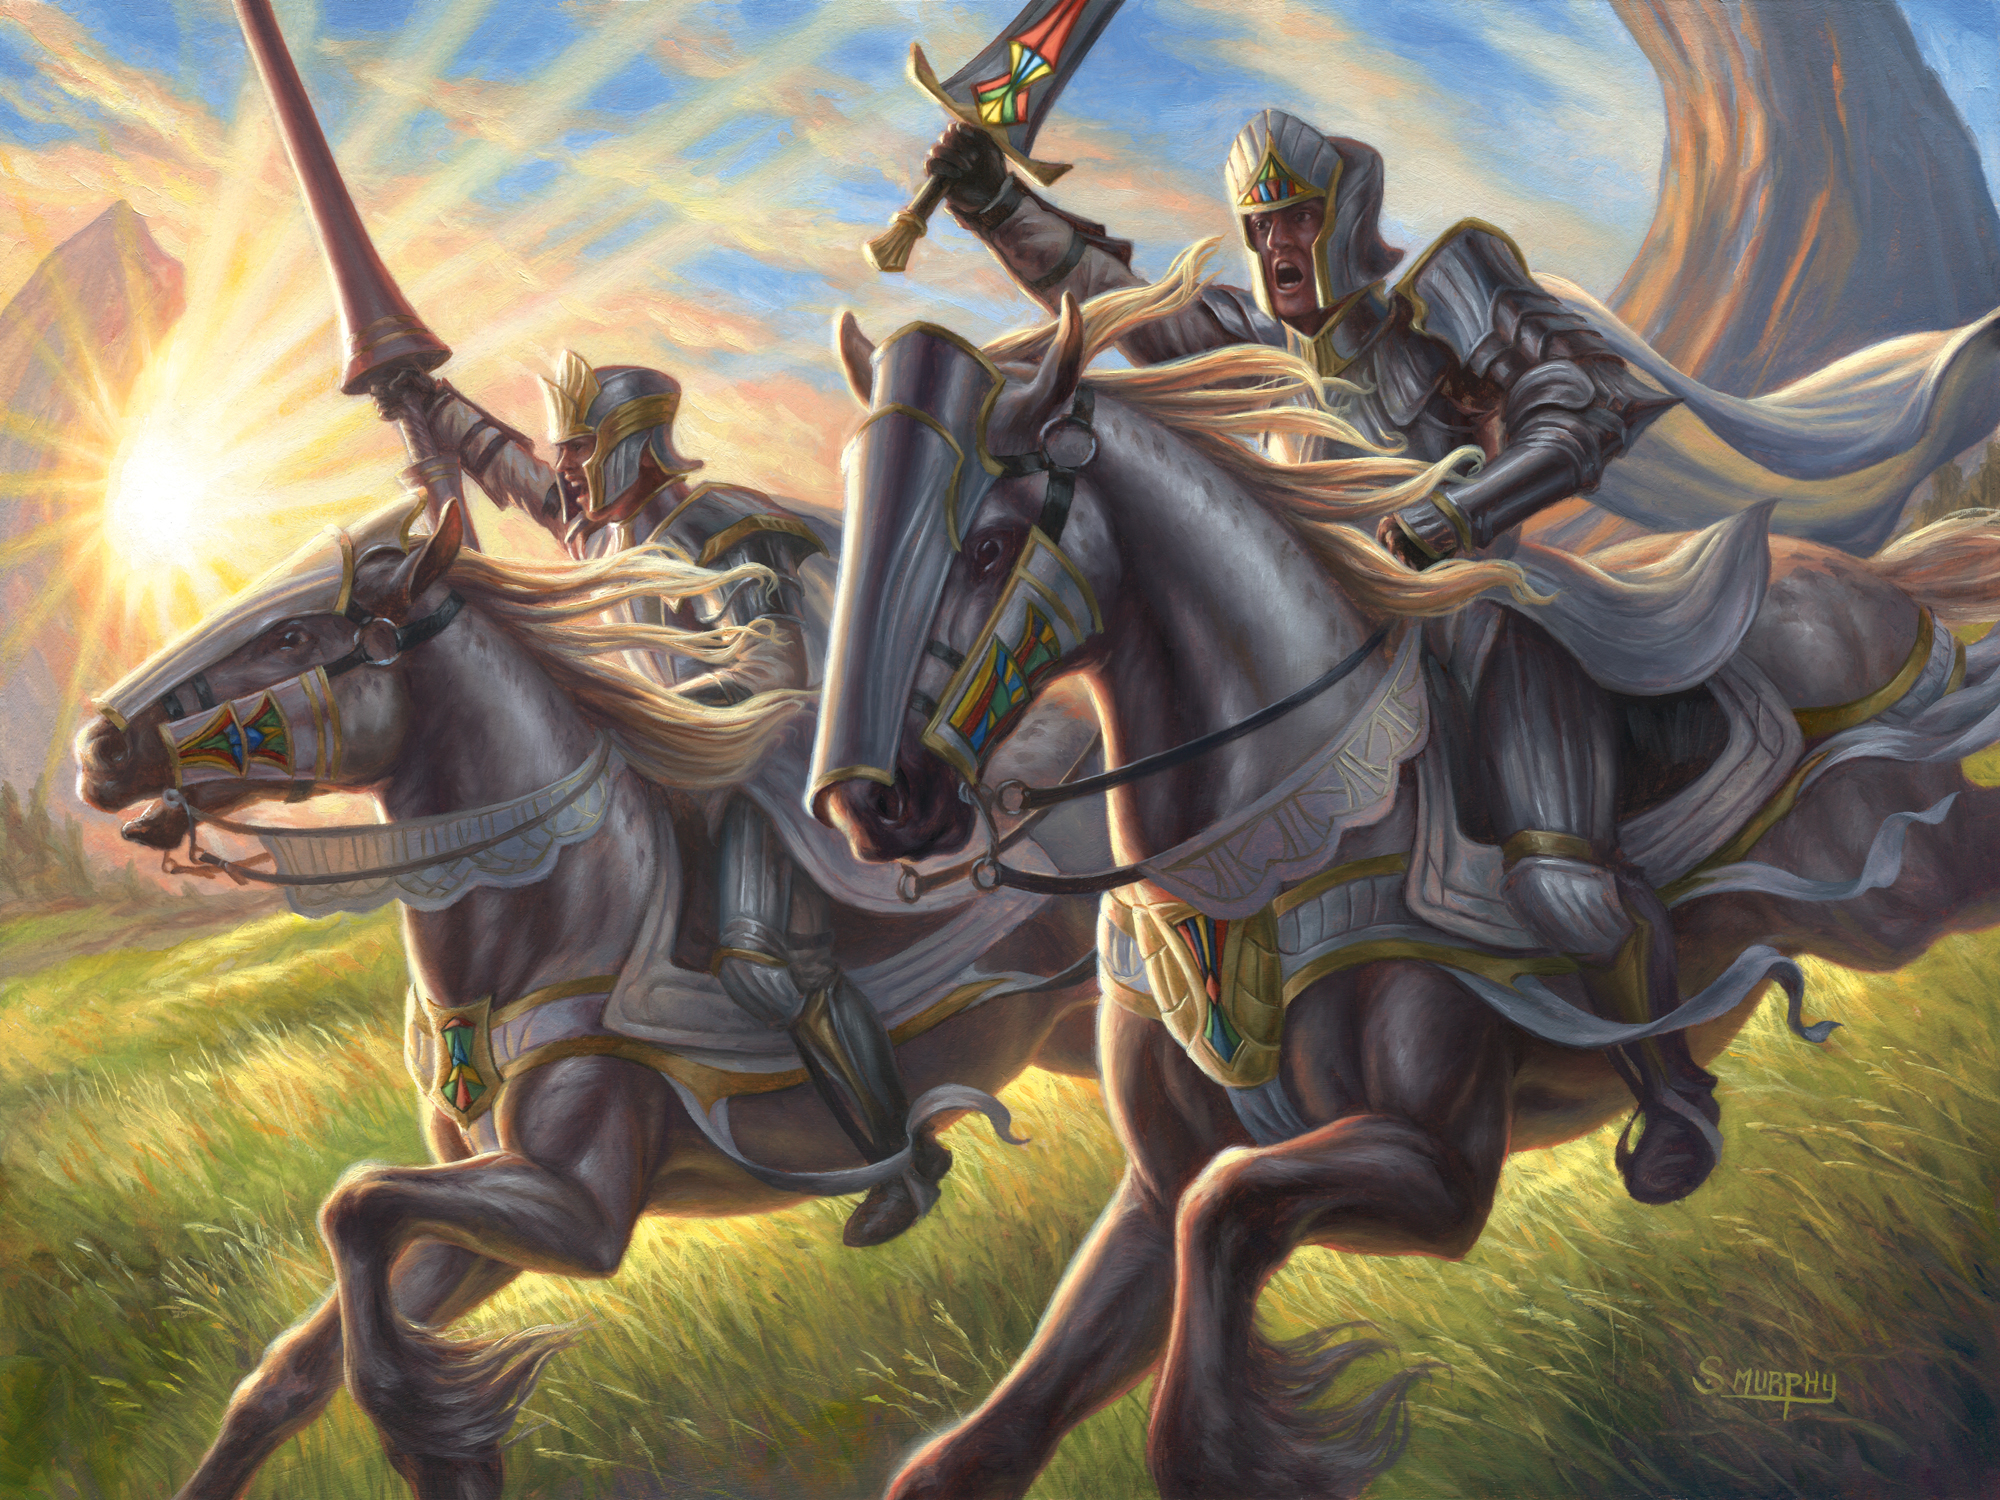 Call the Cavalry Artwork by Scott Murphy